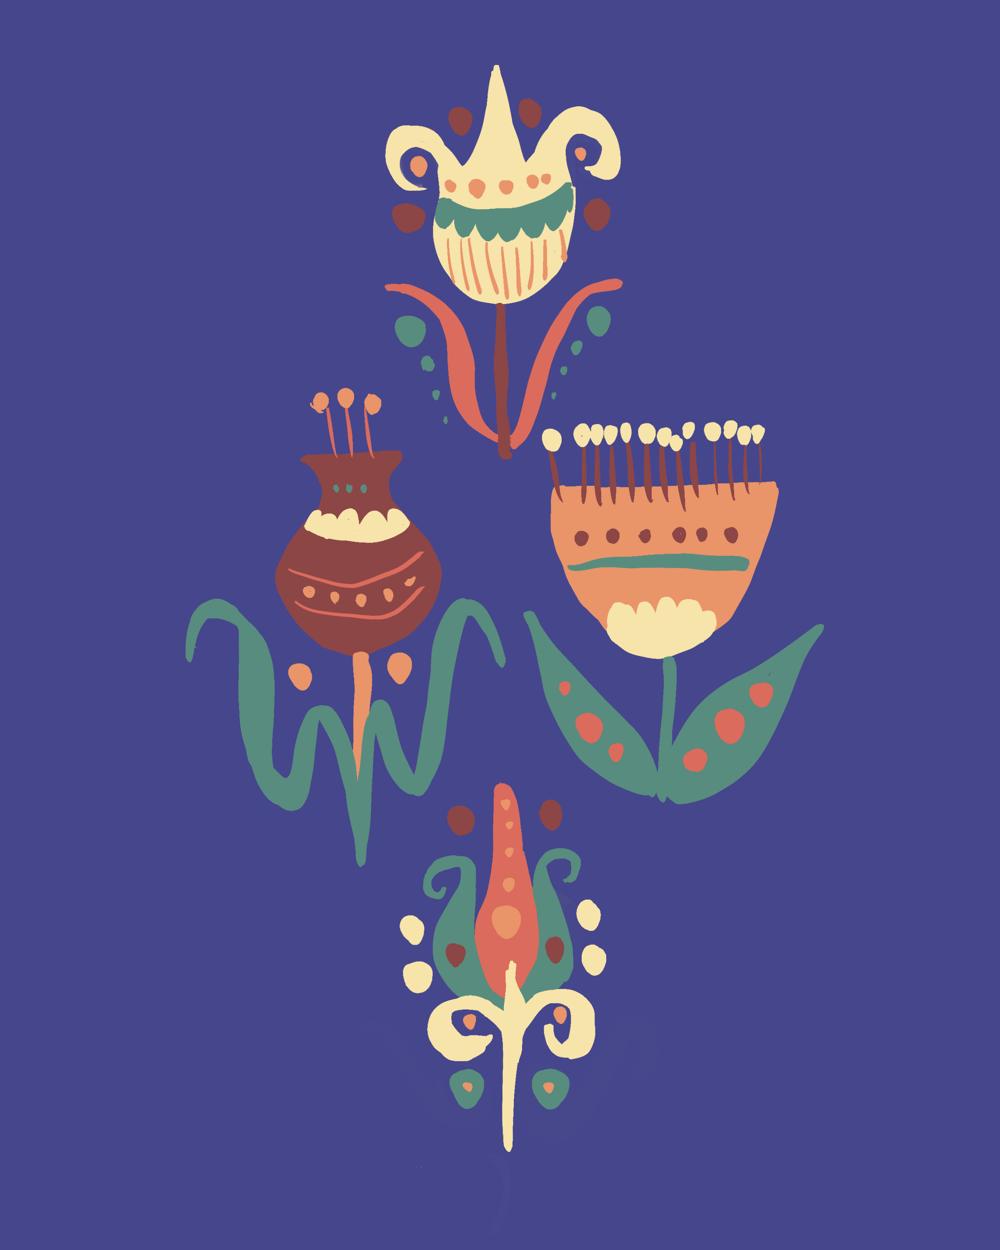 My folk flowers (work in progress) - image 1 - student project